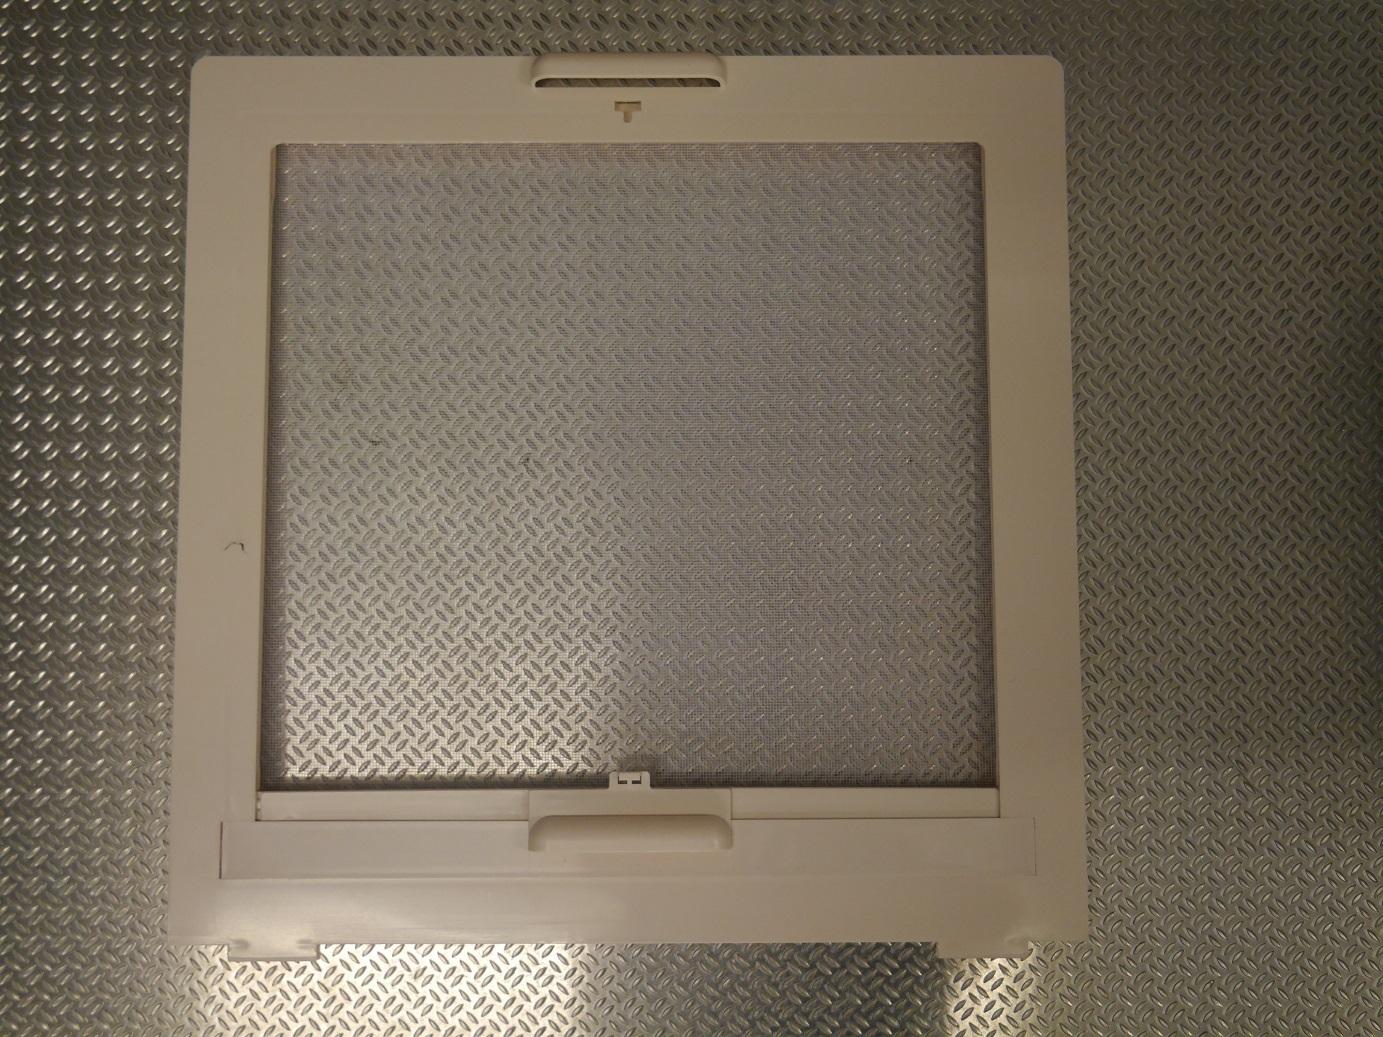 moskitogitter mit verdunklungsrollo f r tabbert wohnwagen. Black Bedroom Furniture Sets. Home Design Ideas